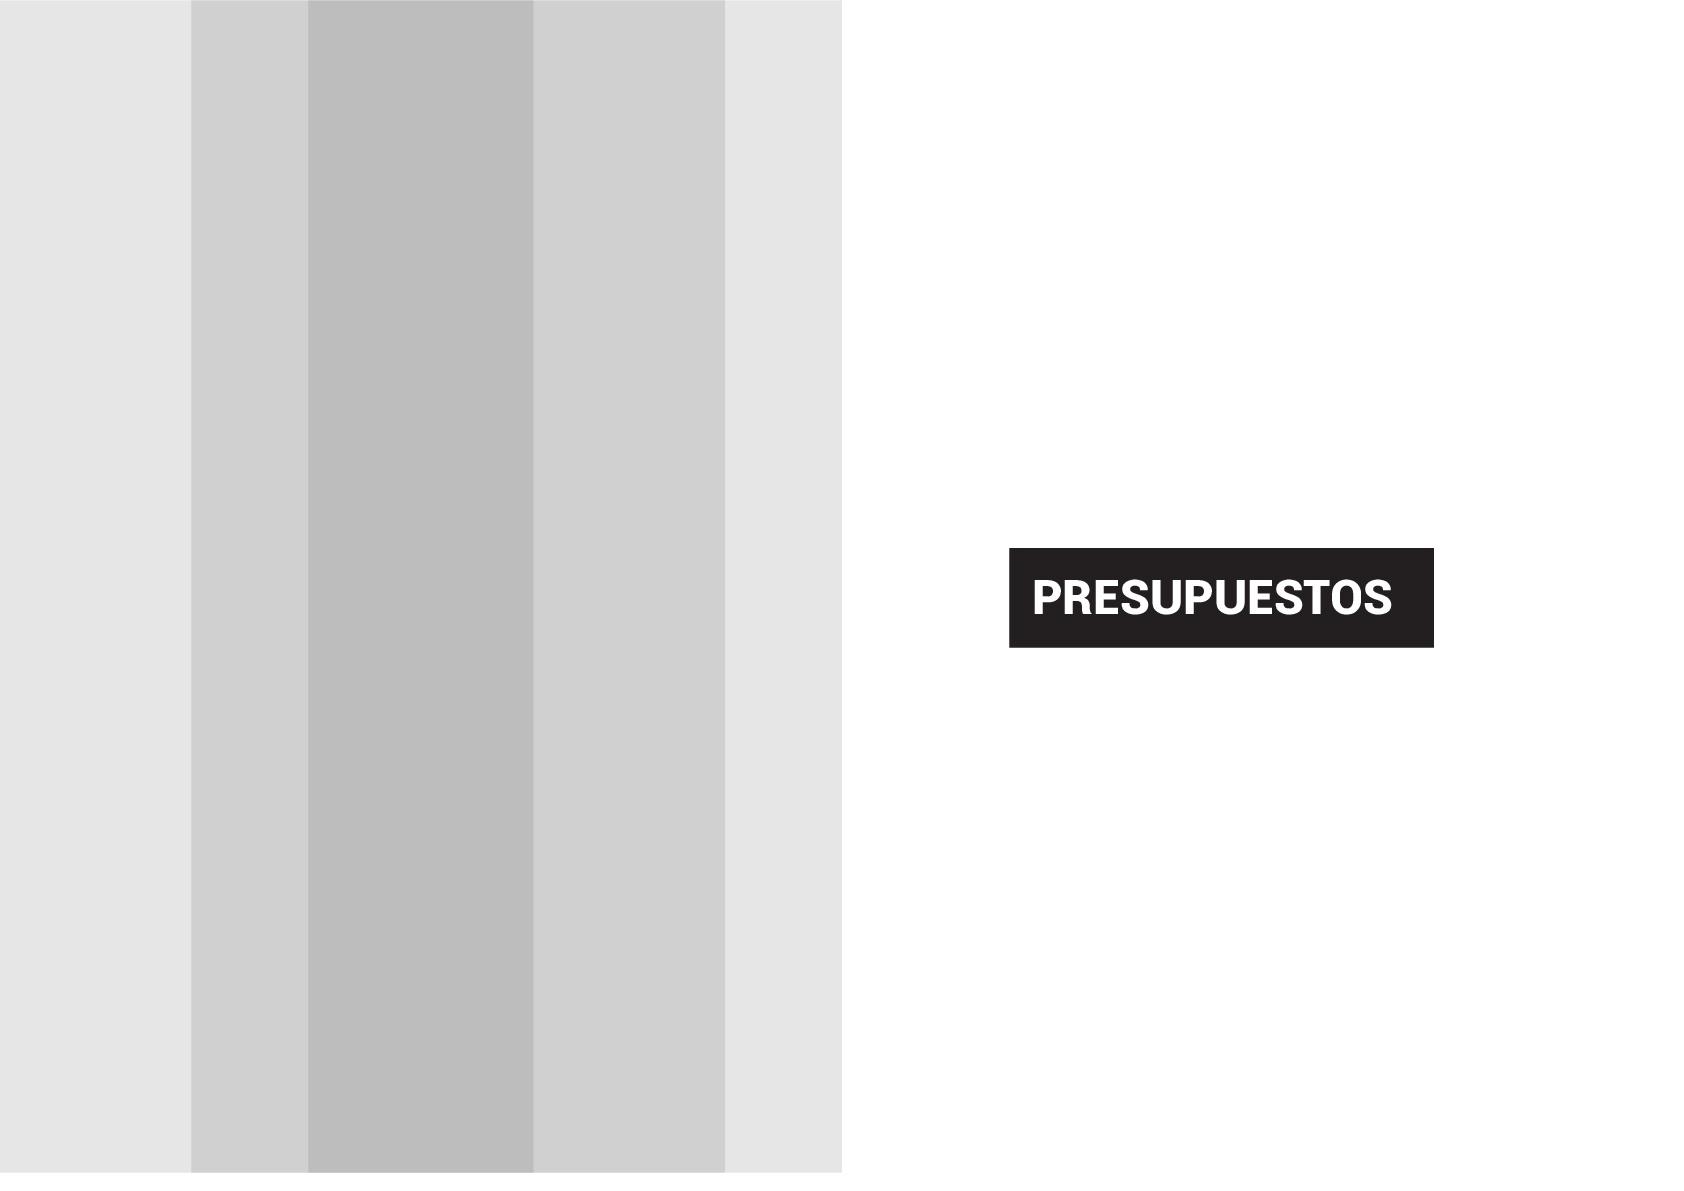 IVAJ-GRAFICO-PRESUPUESTO-019